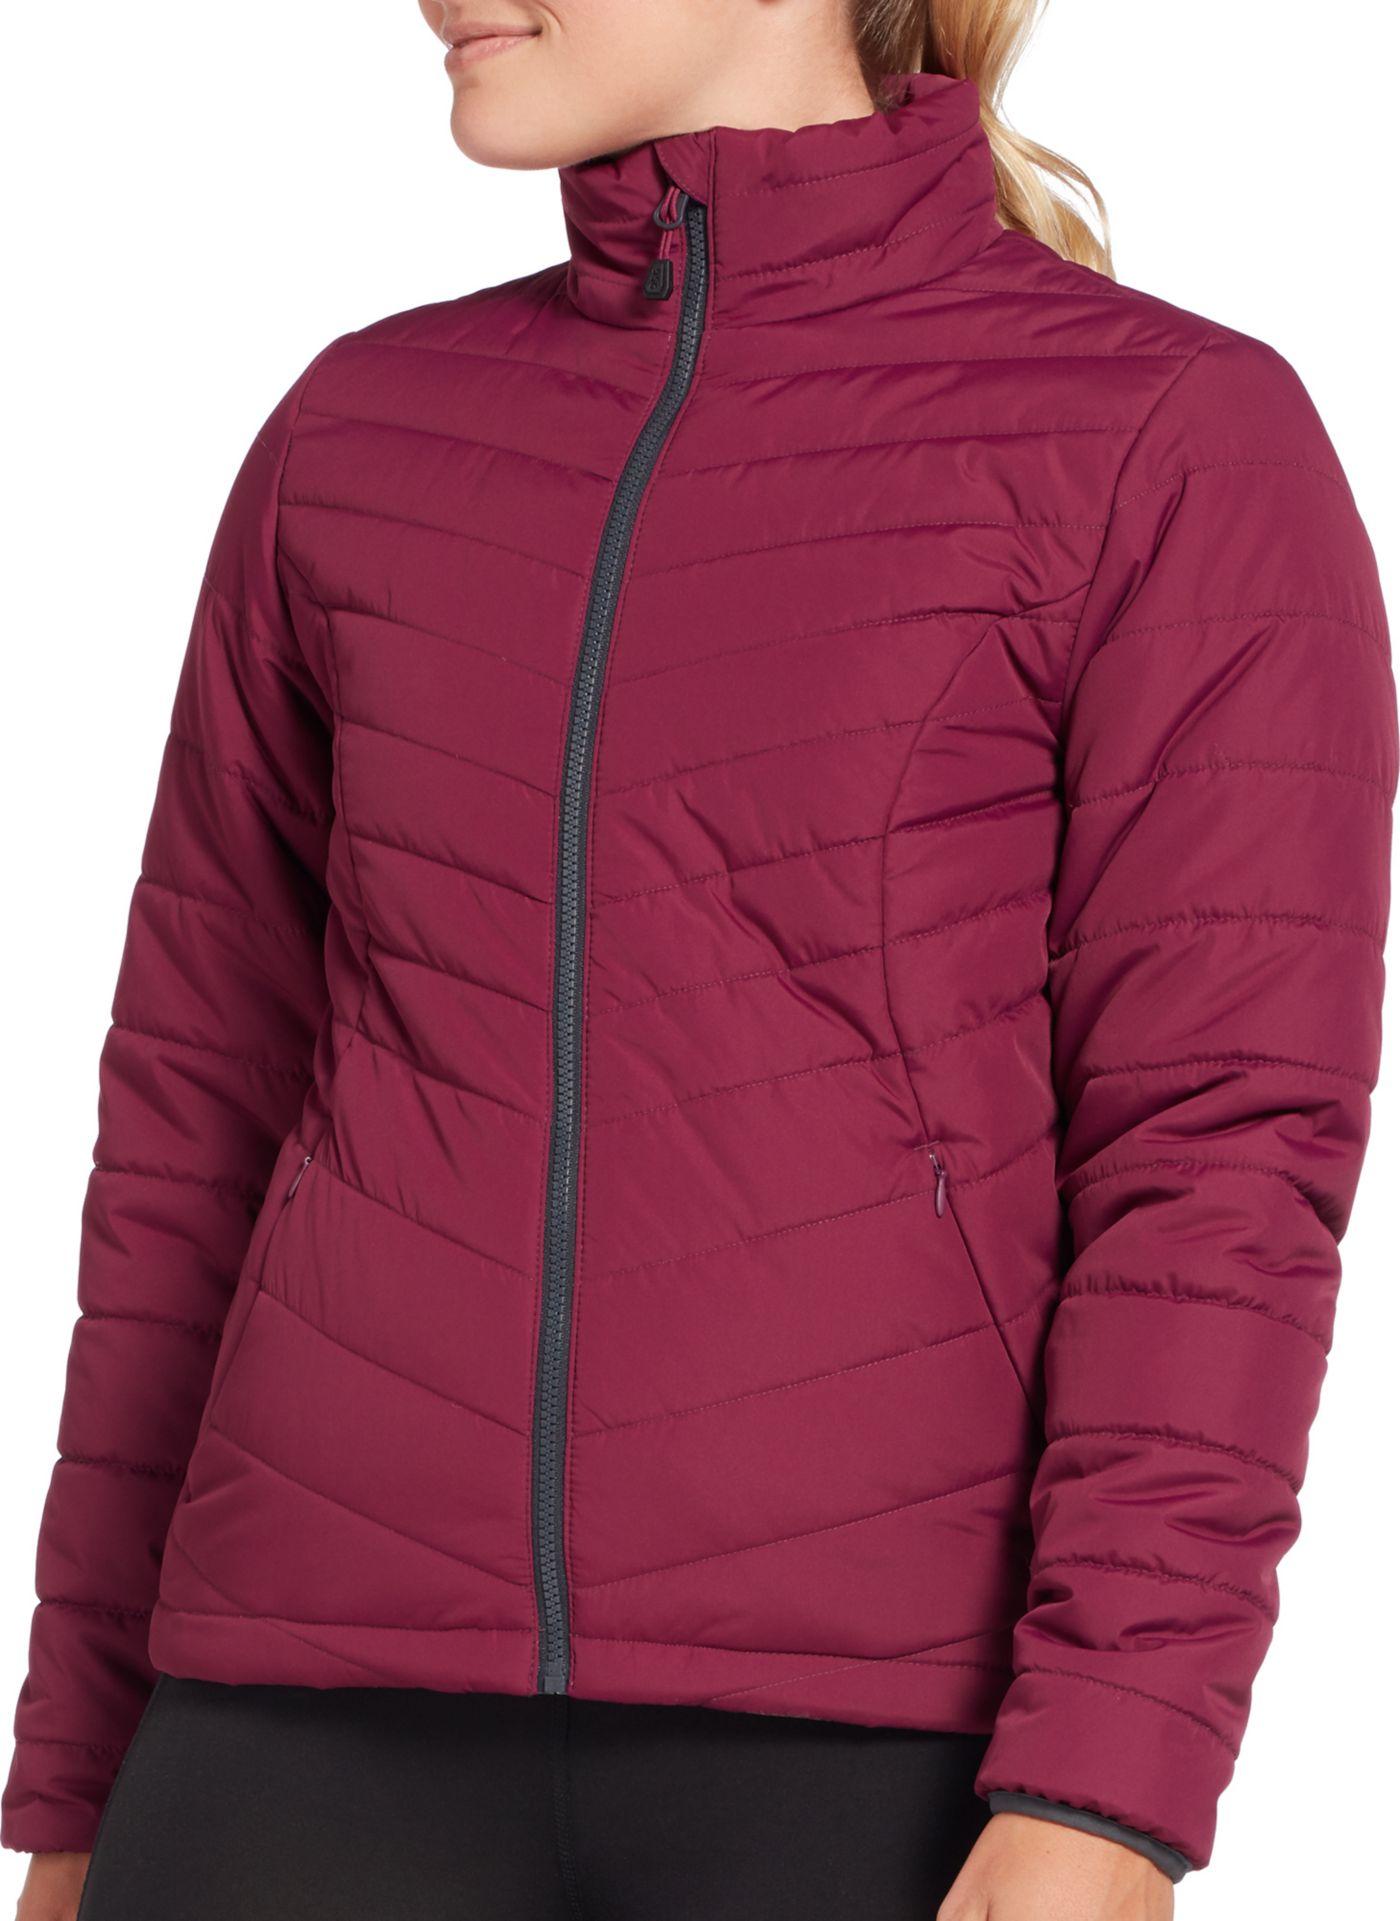 DSG Women's Insulated Jacket